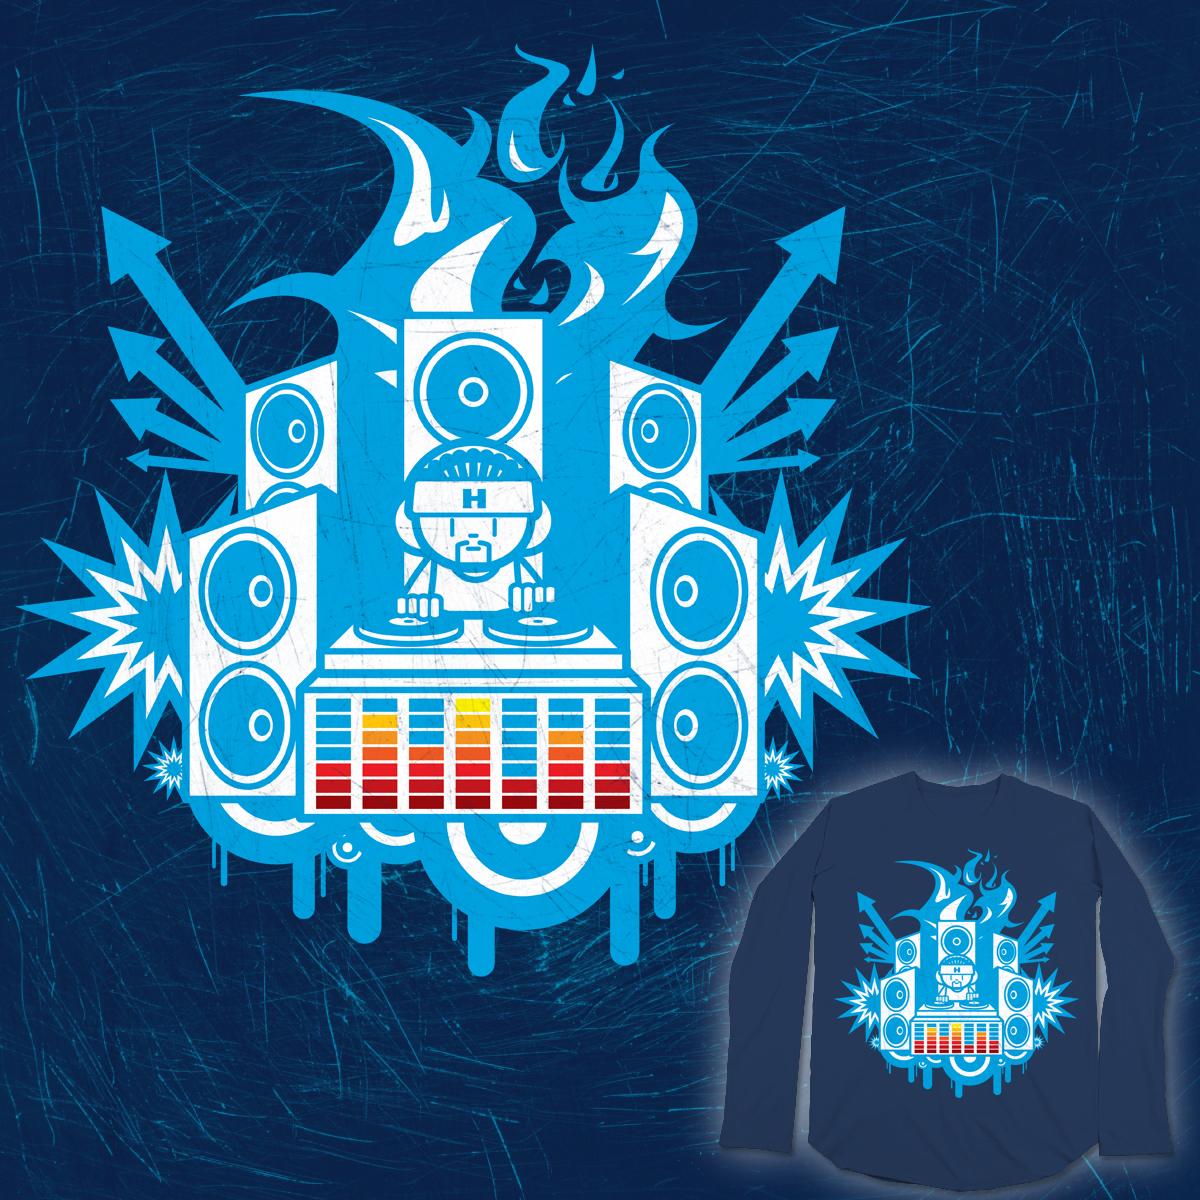 Yo! DJ! by hookeeak on Threadless